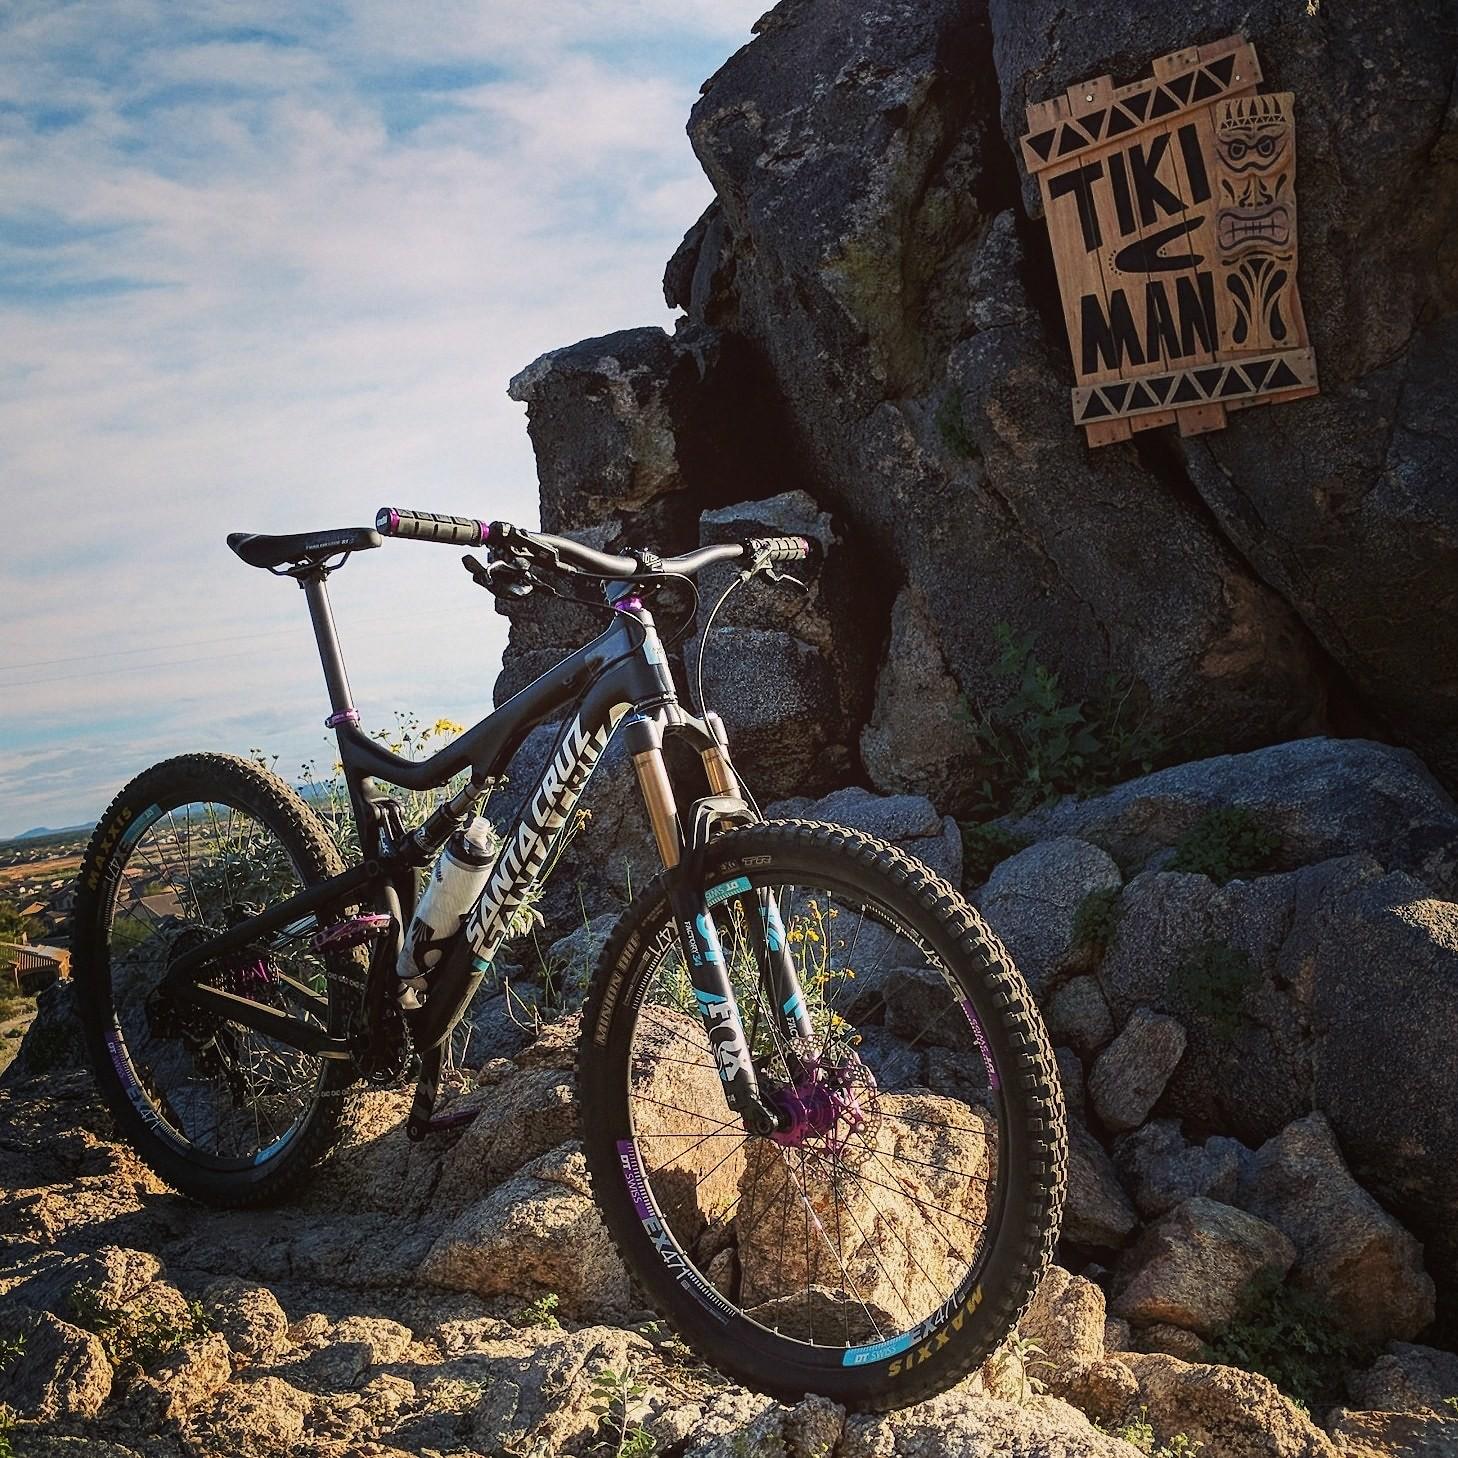 Tiki Man Trail in AZ